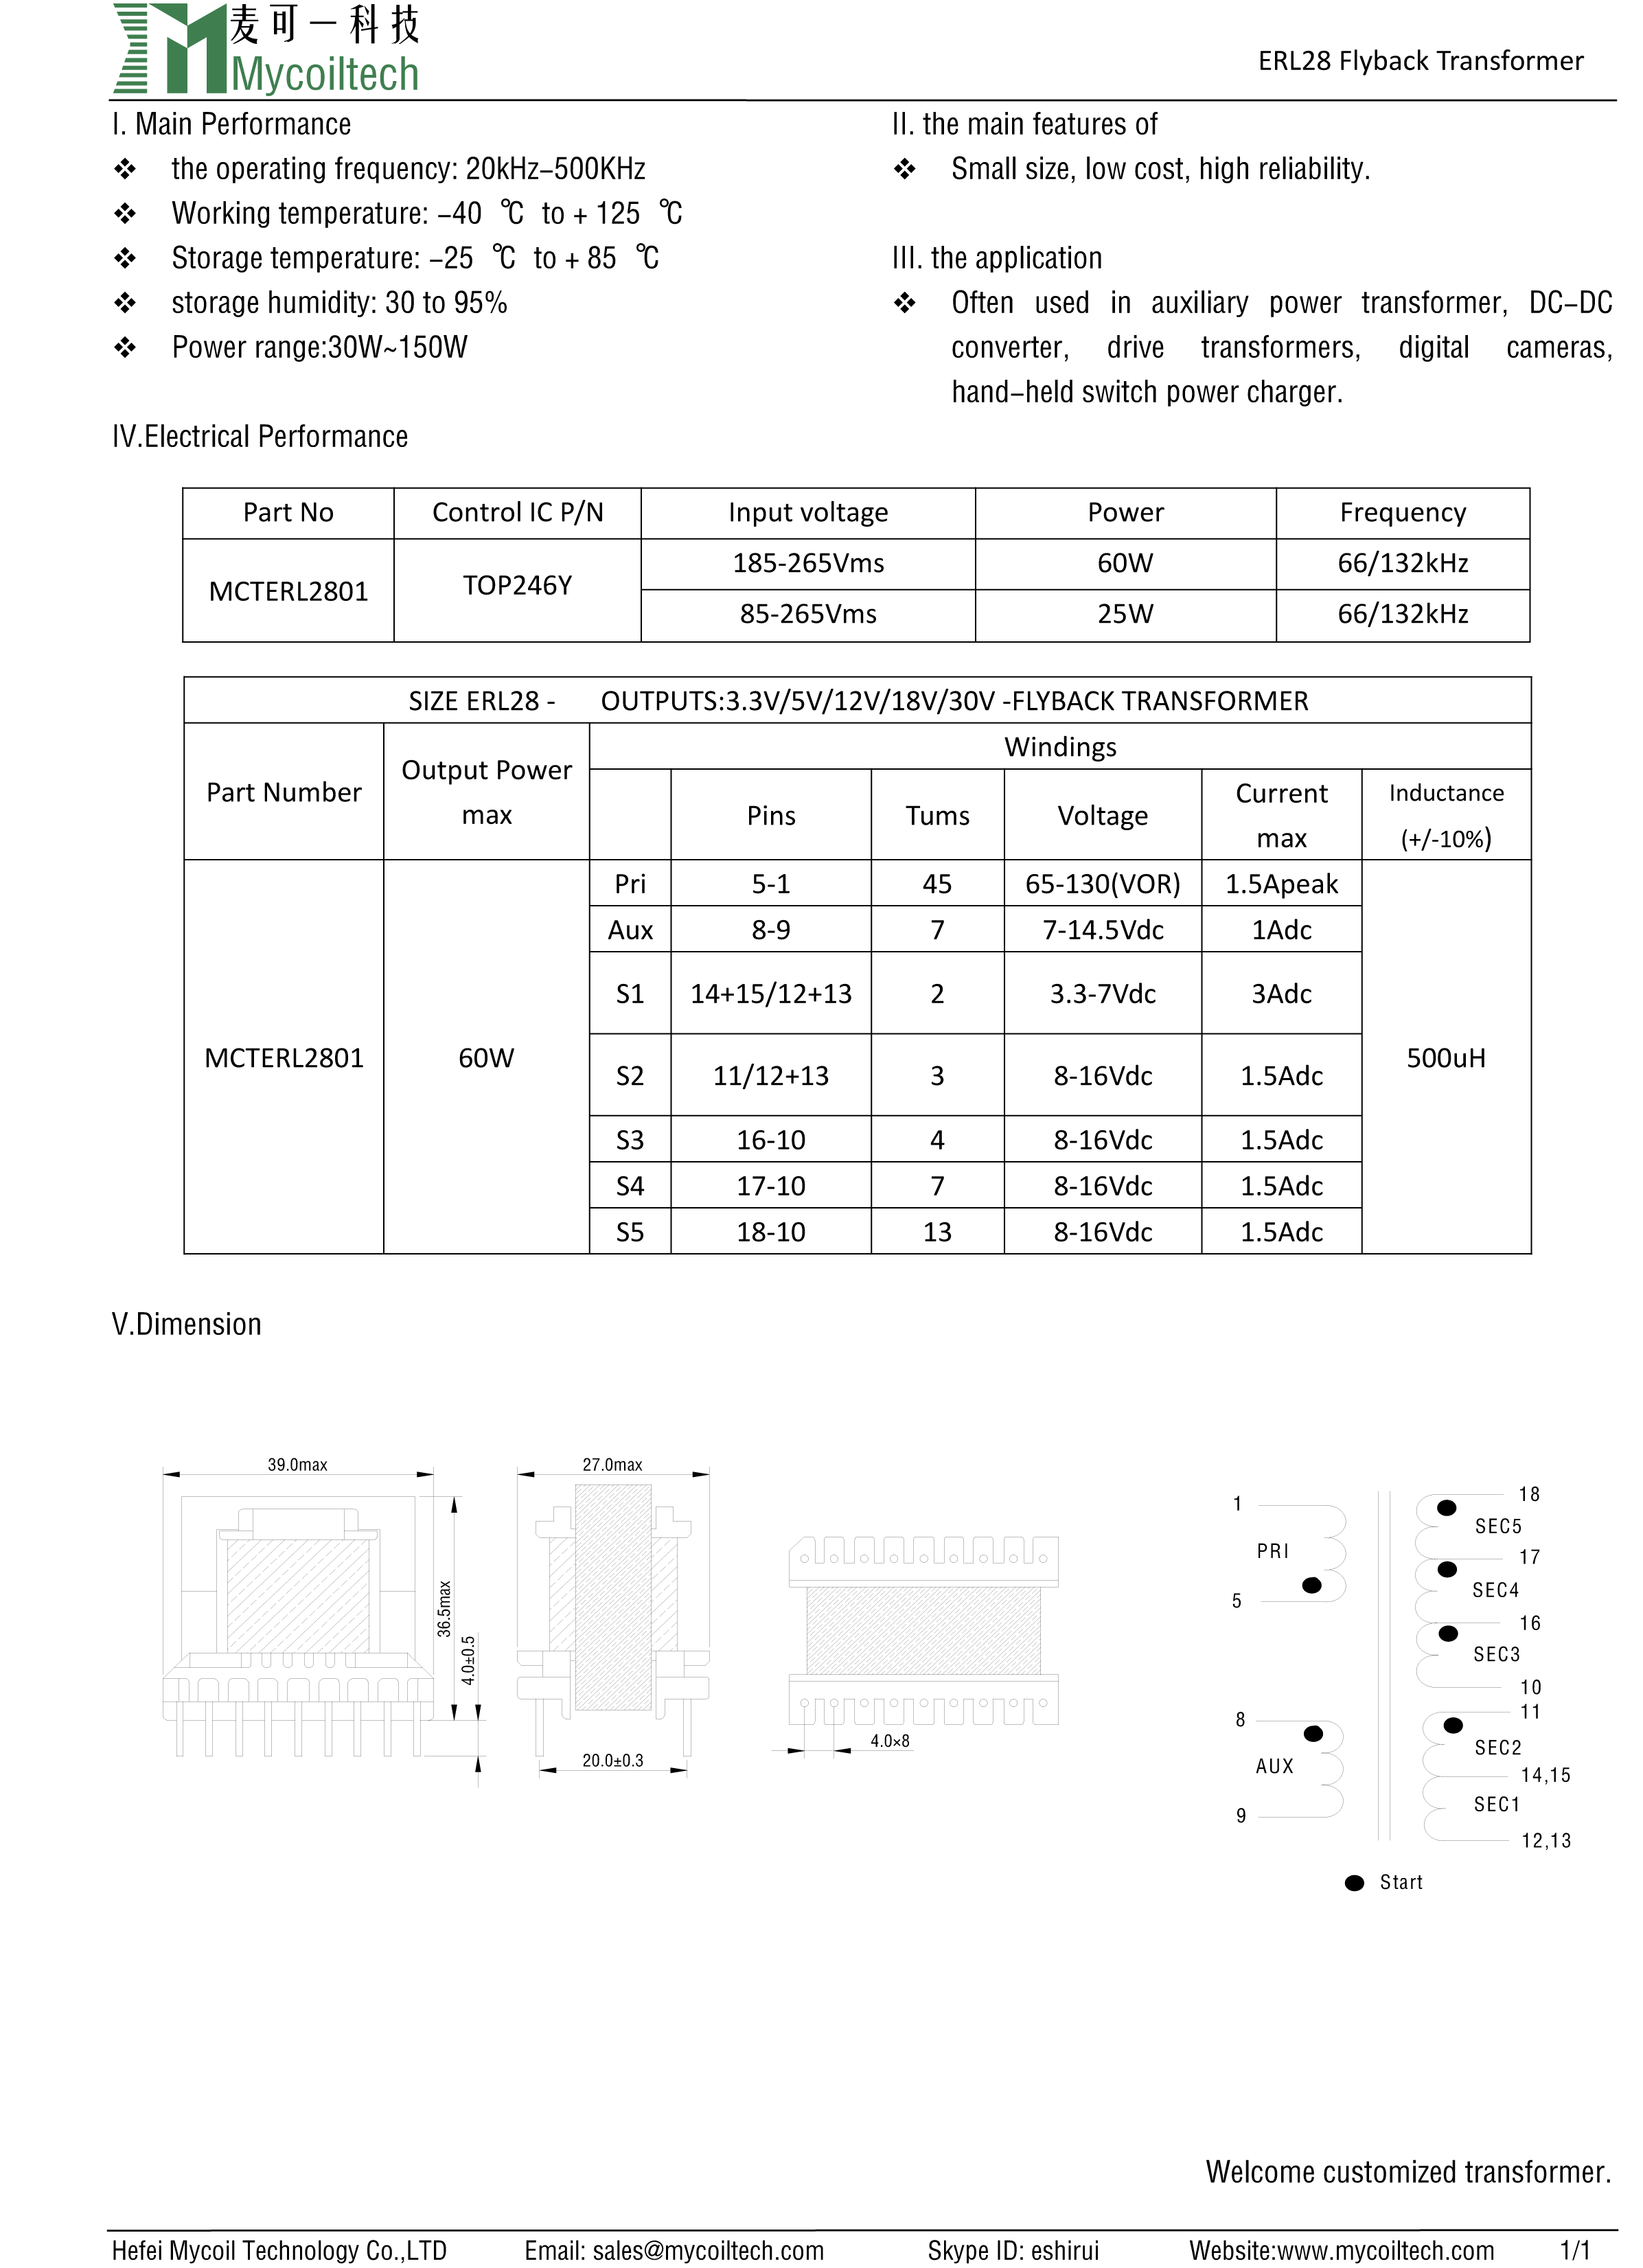 ERL28 Single Phase Transformer